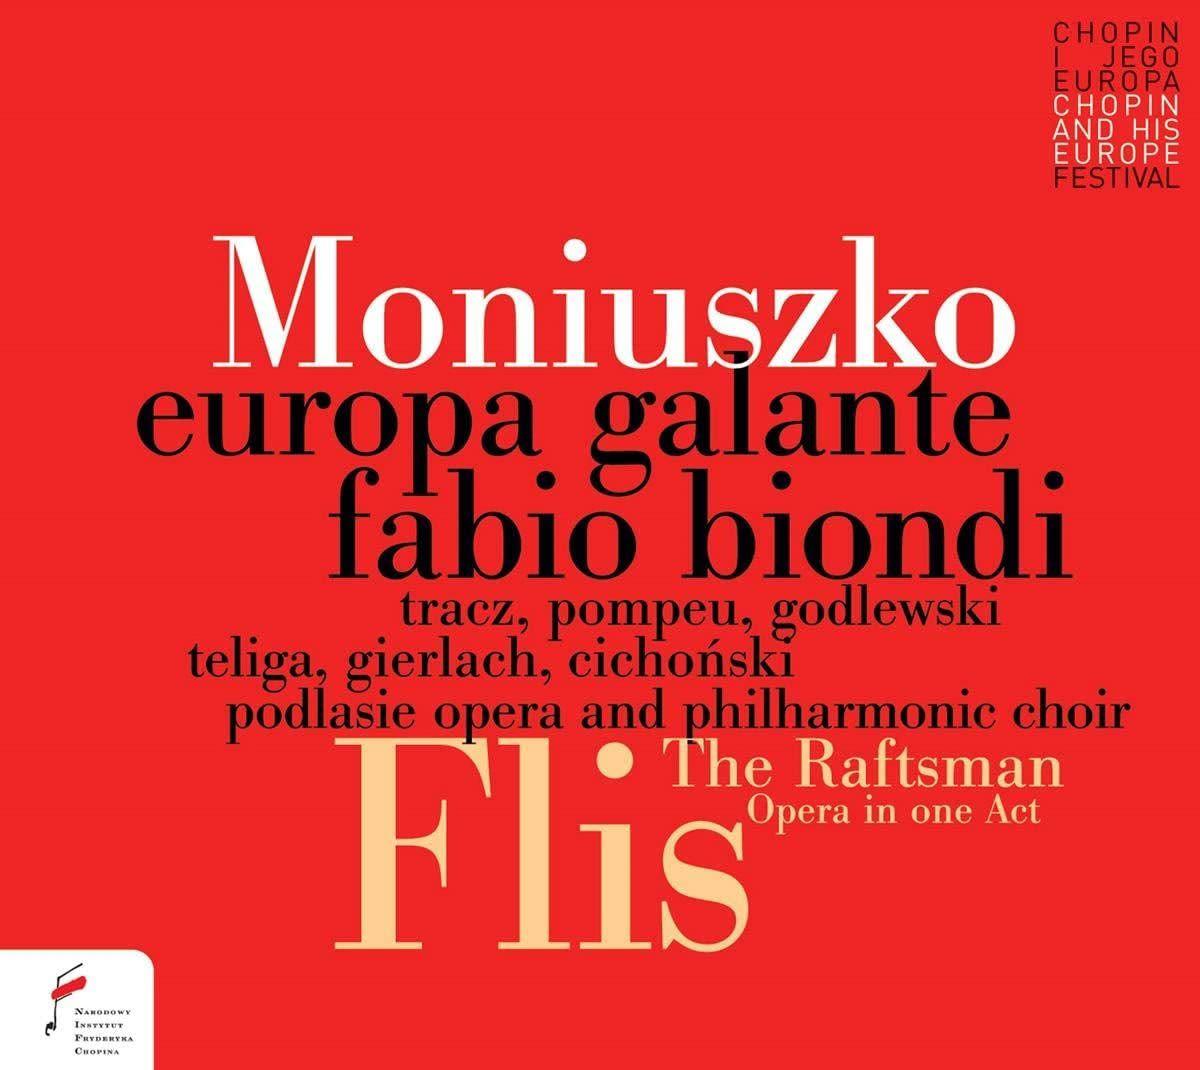 Photo No.1 of Stanislaw Moniuszko: Flis - the Raftsman